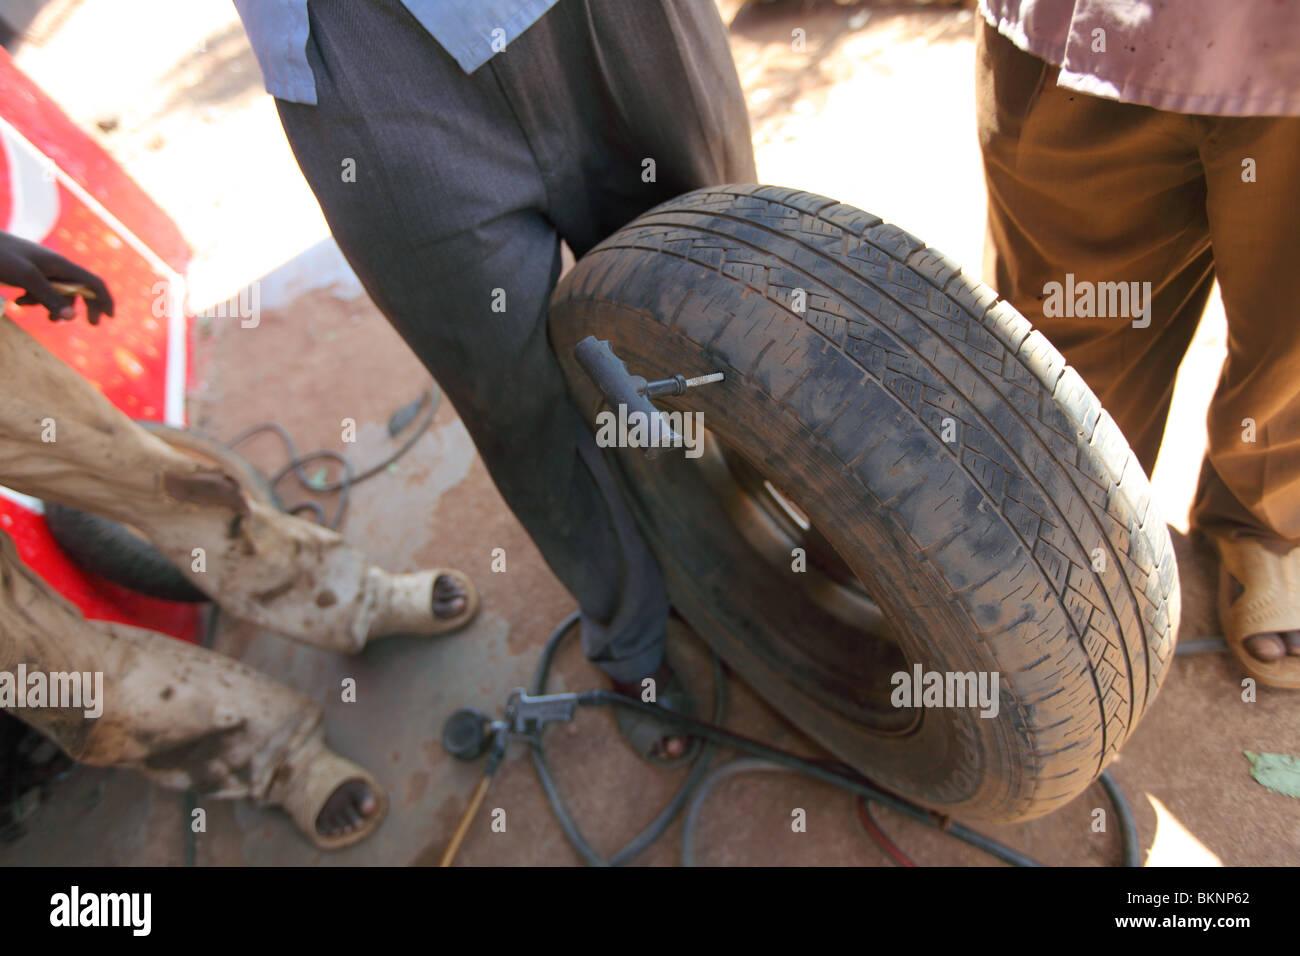 Kenya Africa Car Toyota Rav Breakdown Rental Car Flat Tire